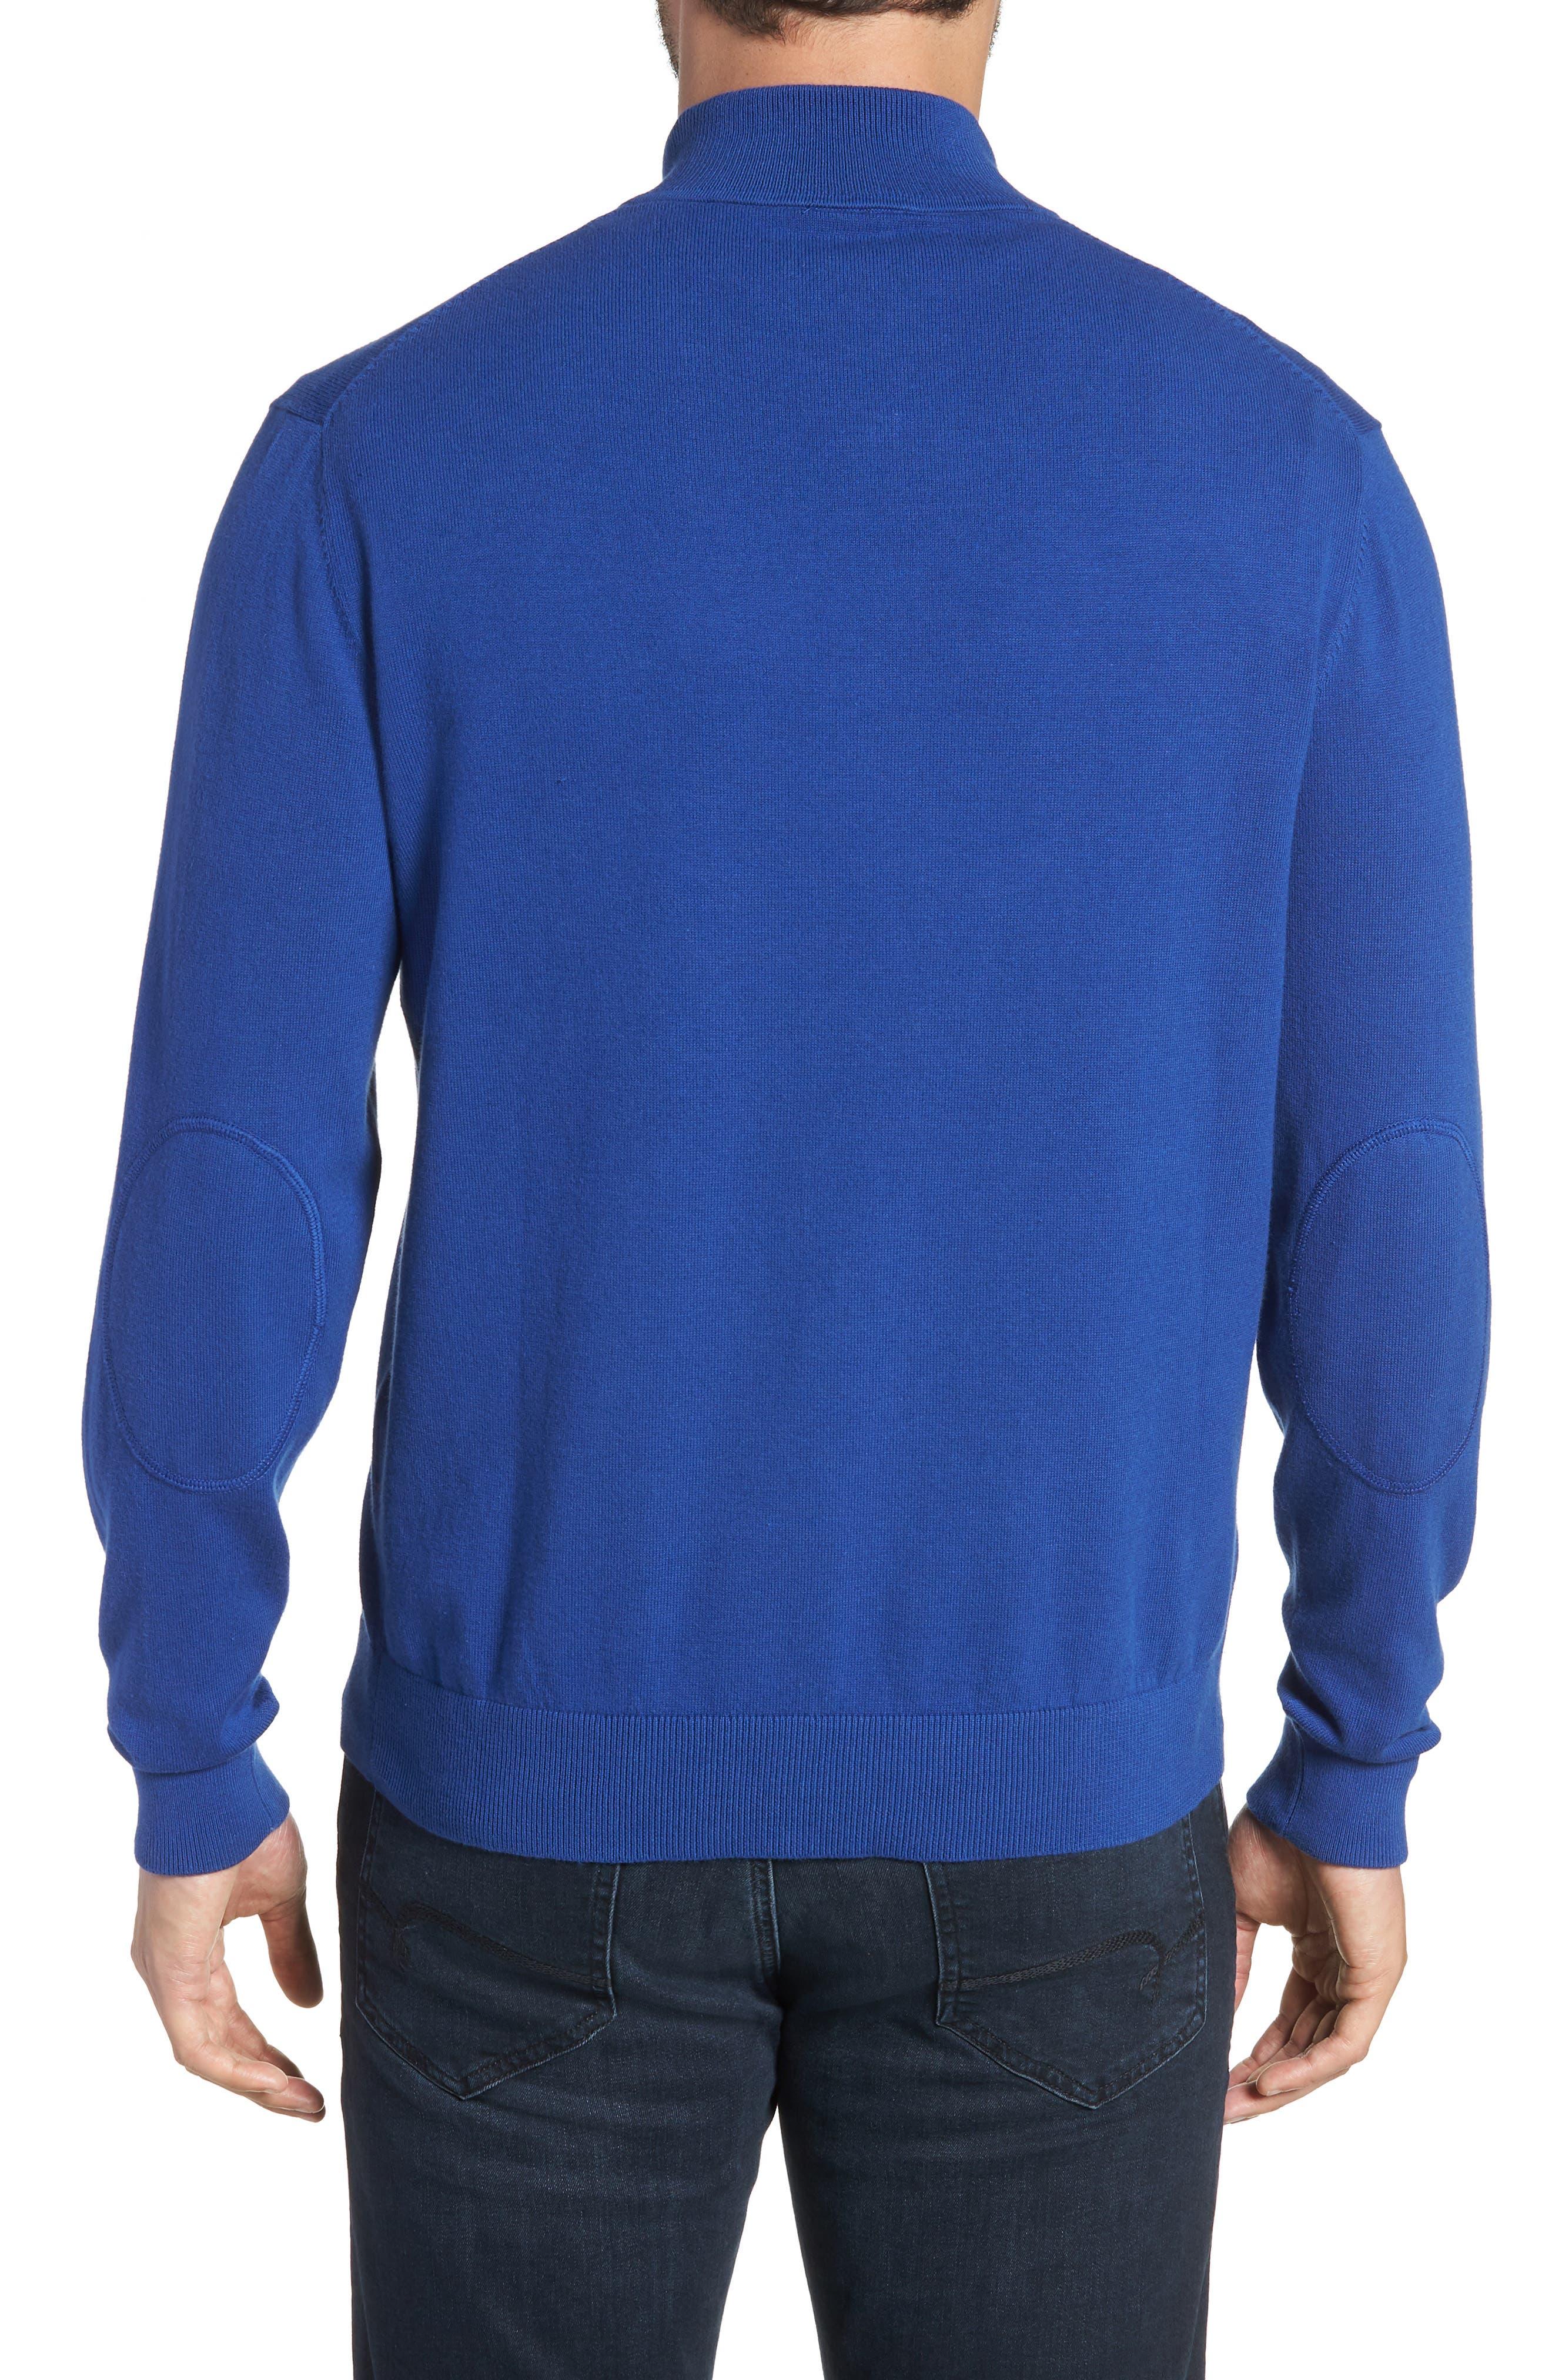 Buffalo Bills - Lakemont Regular Fit Quarter Zip Sweater,                             Alternate thumbnail 2, color,                             TOUR BLUE